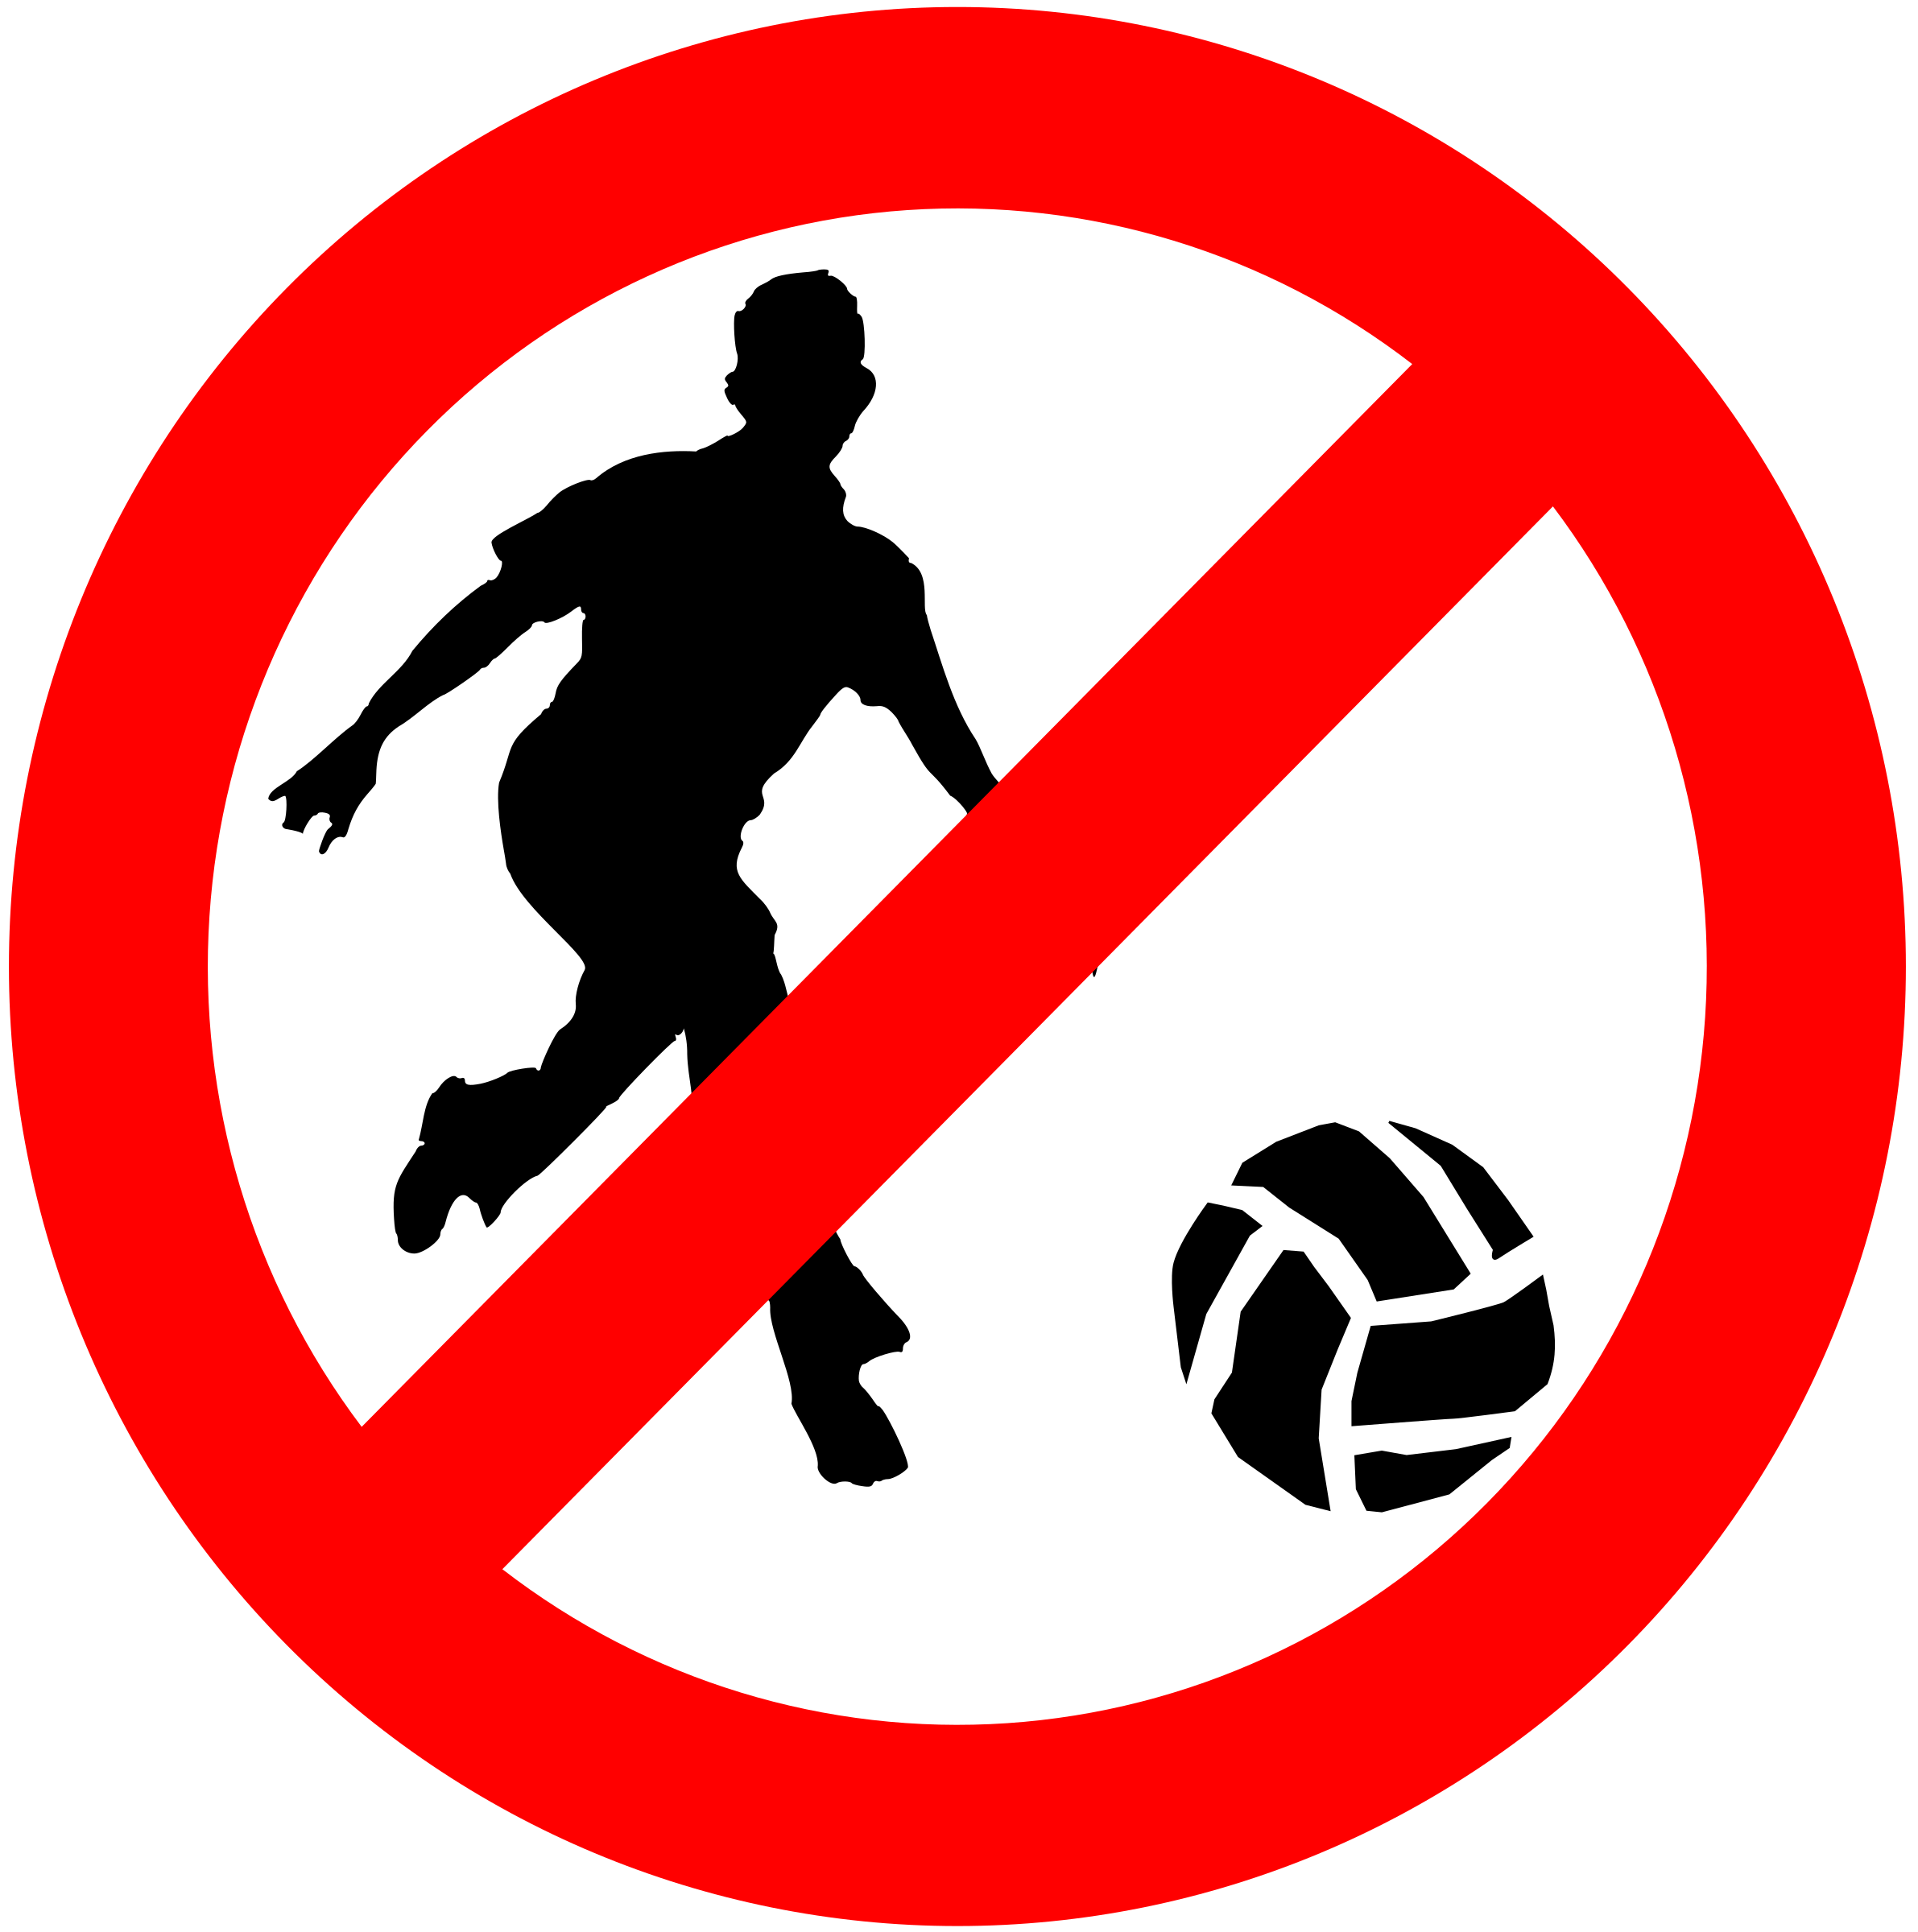 Prohibit big image png. Games clipart ball